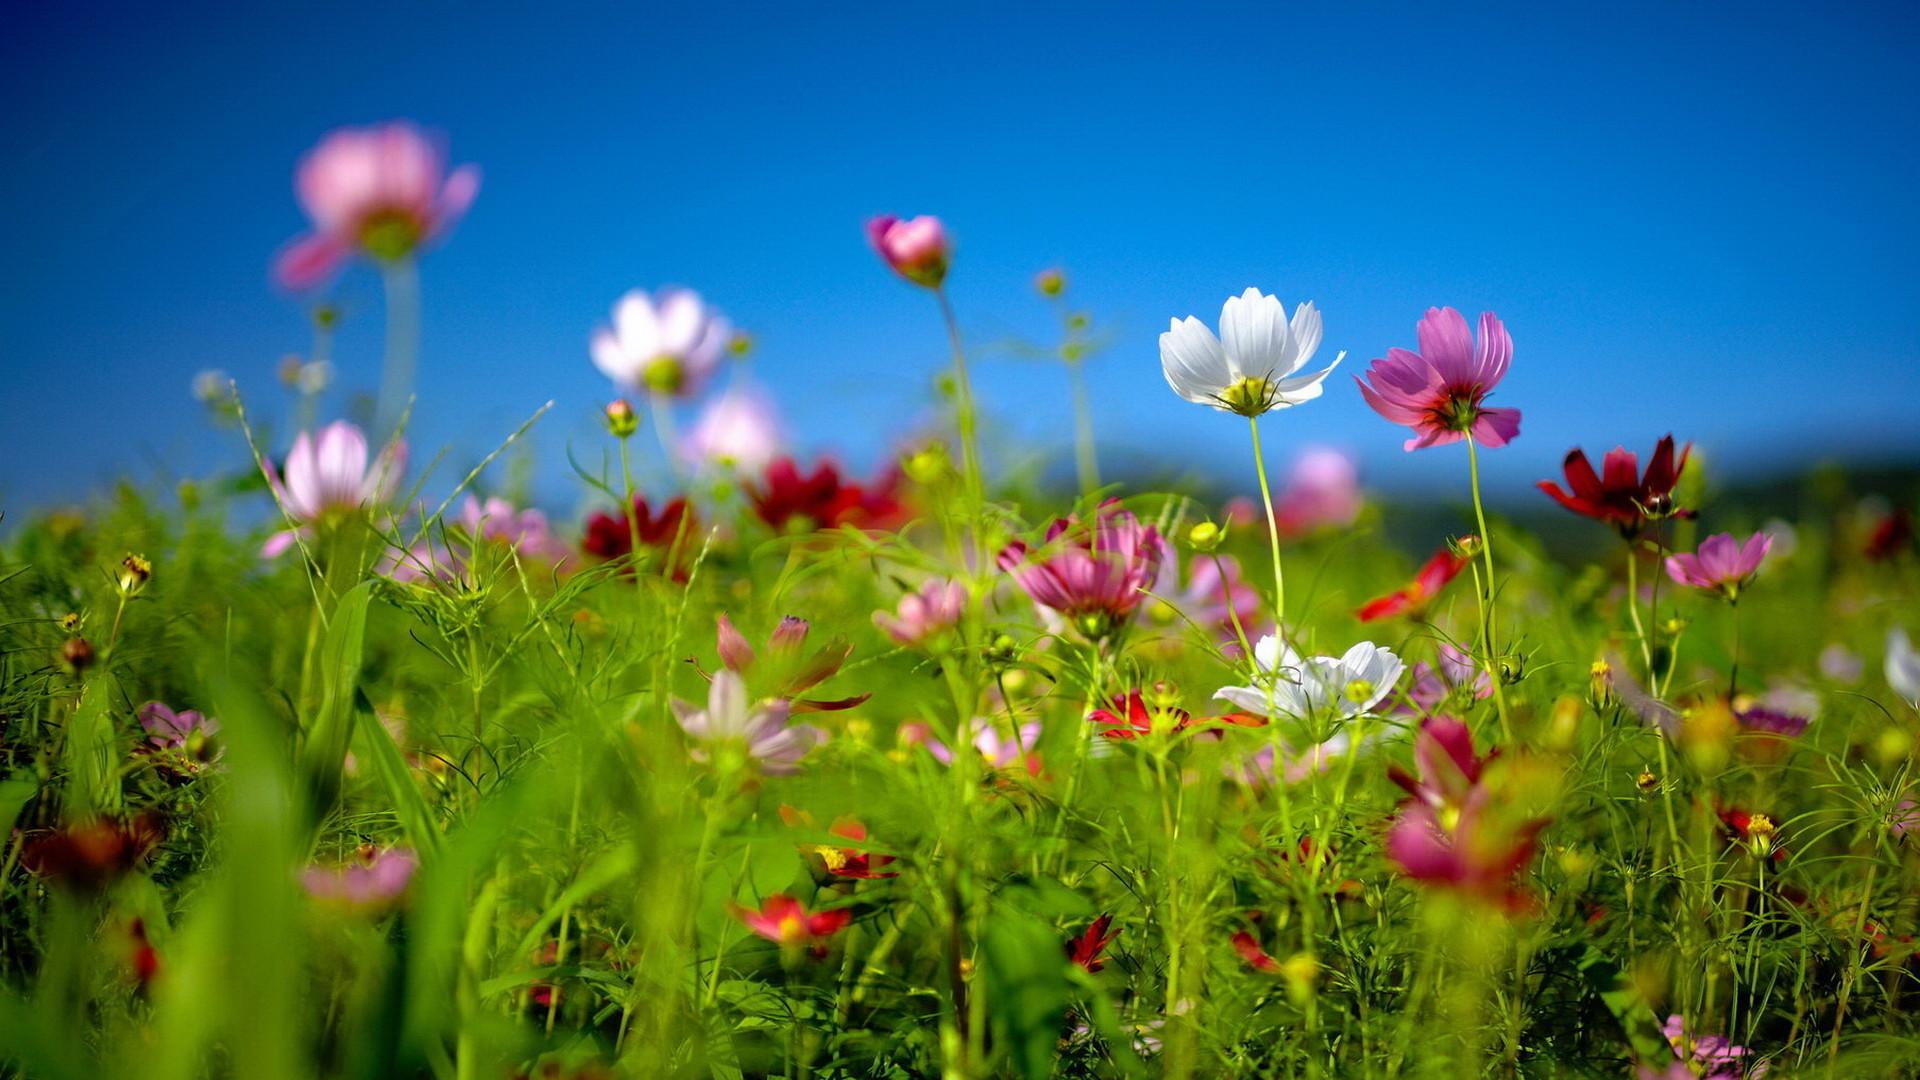 Free Spring Desktop Wallpaper   … Download free Spring wildflowers  Desktop background and wallpapers